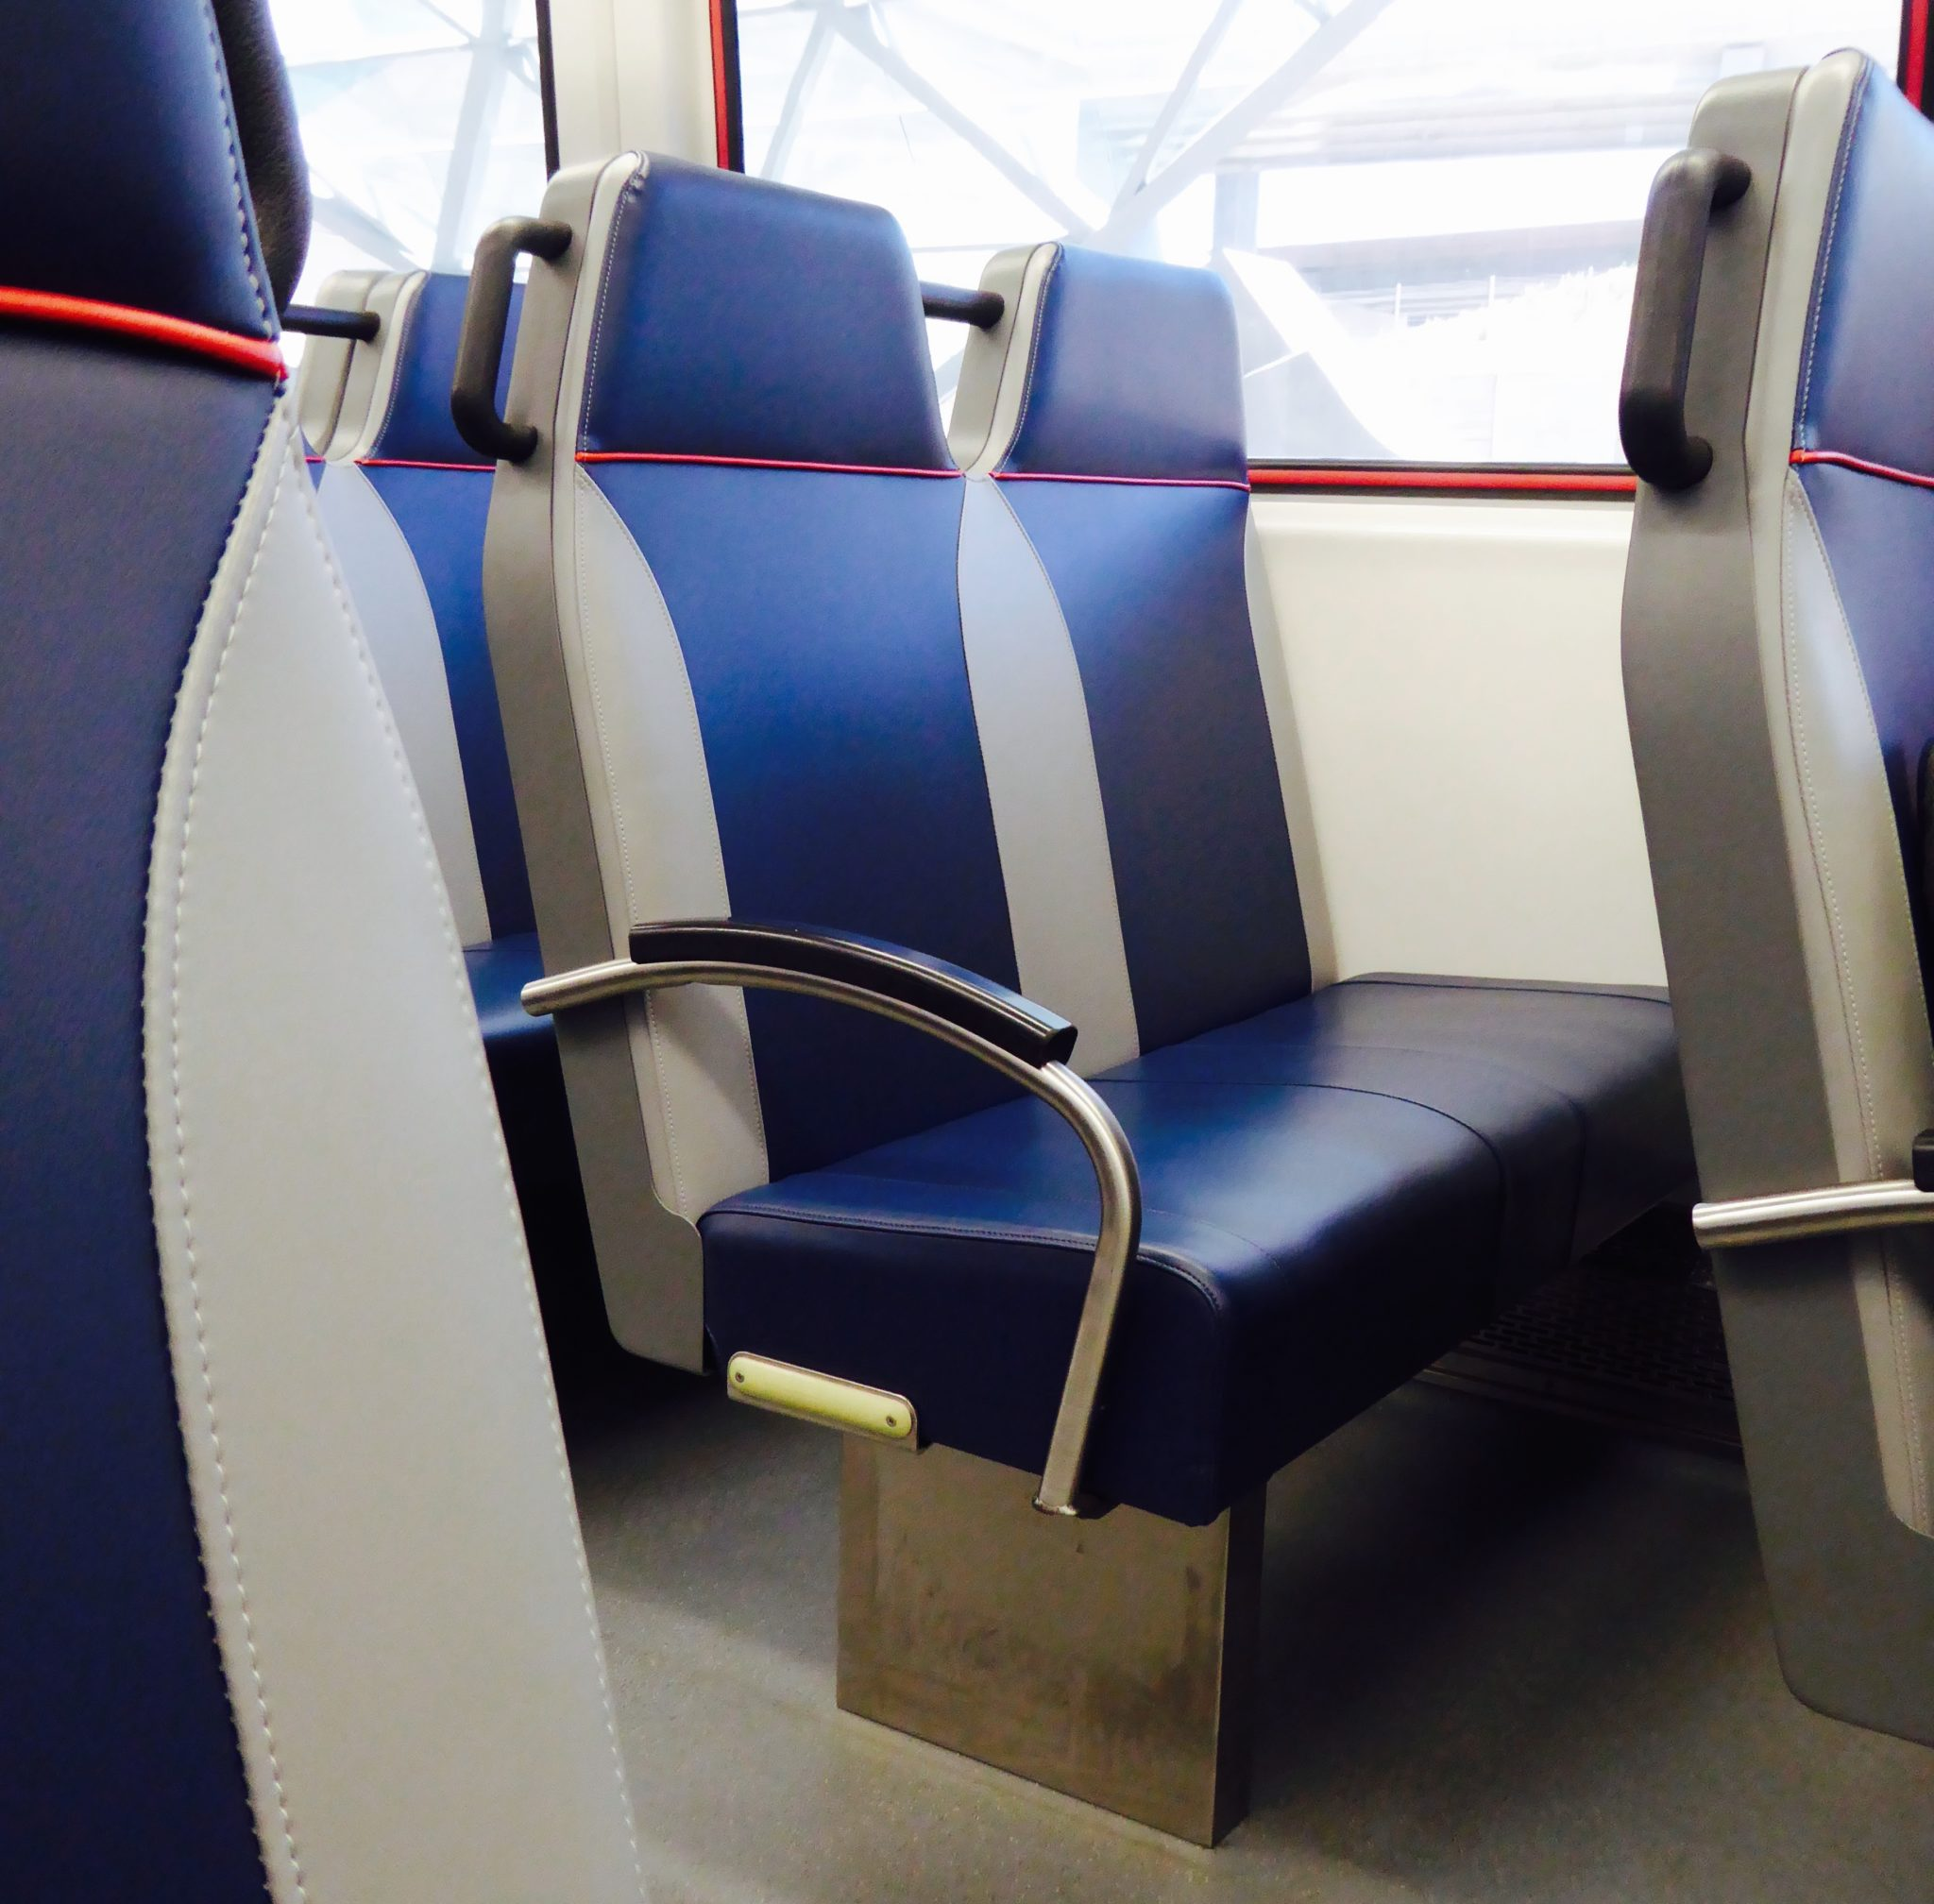 light rail to DIA business travel life 7